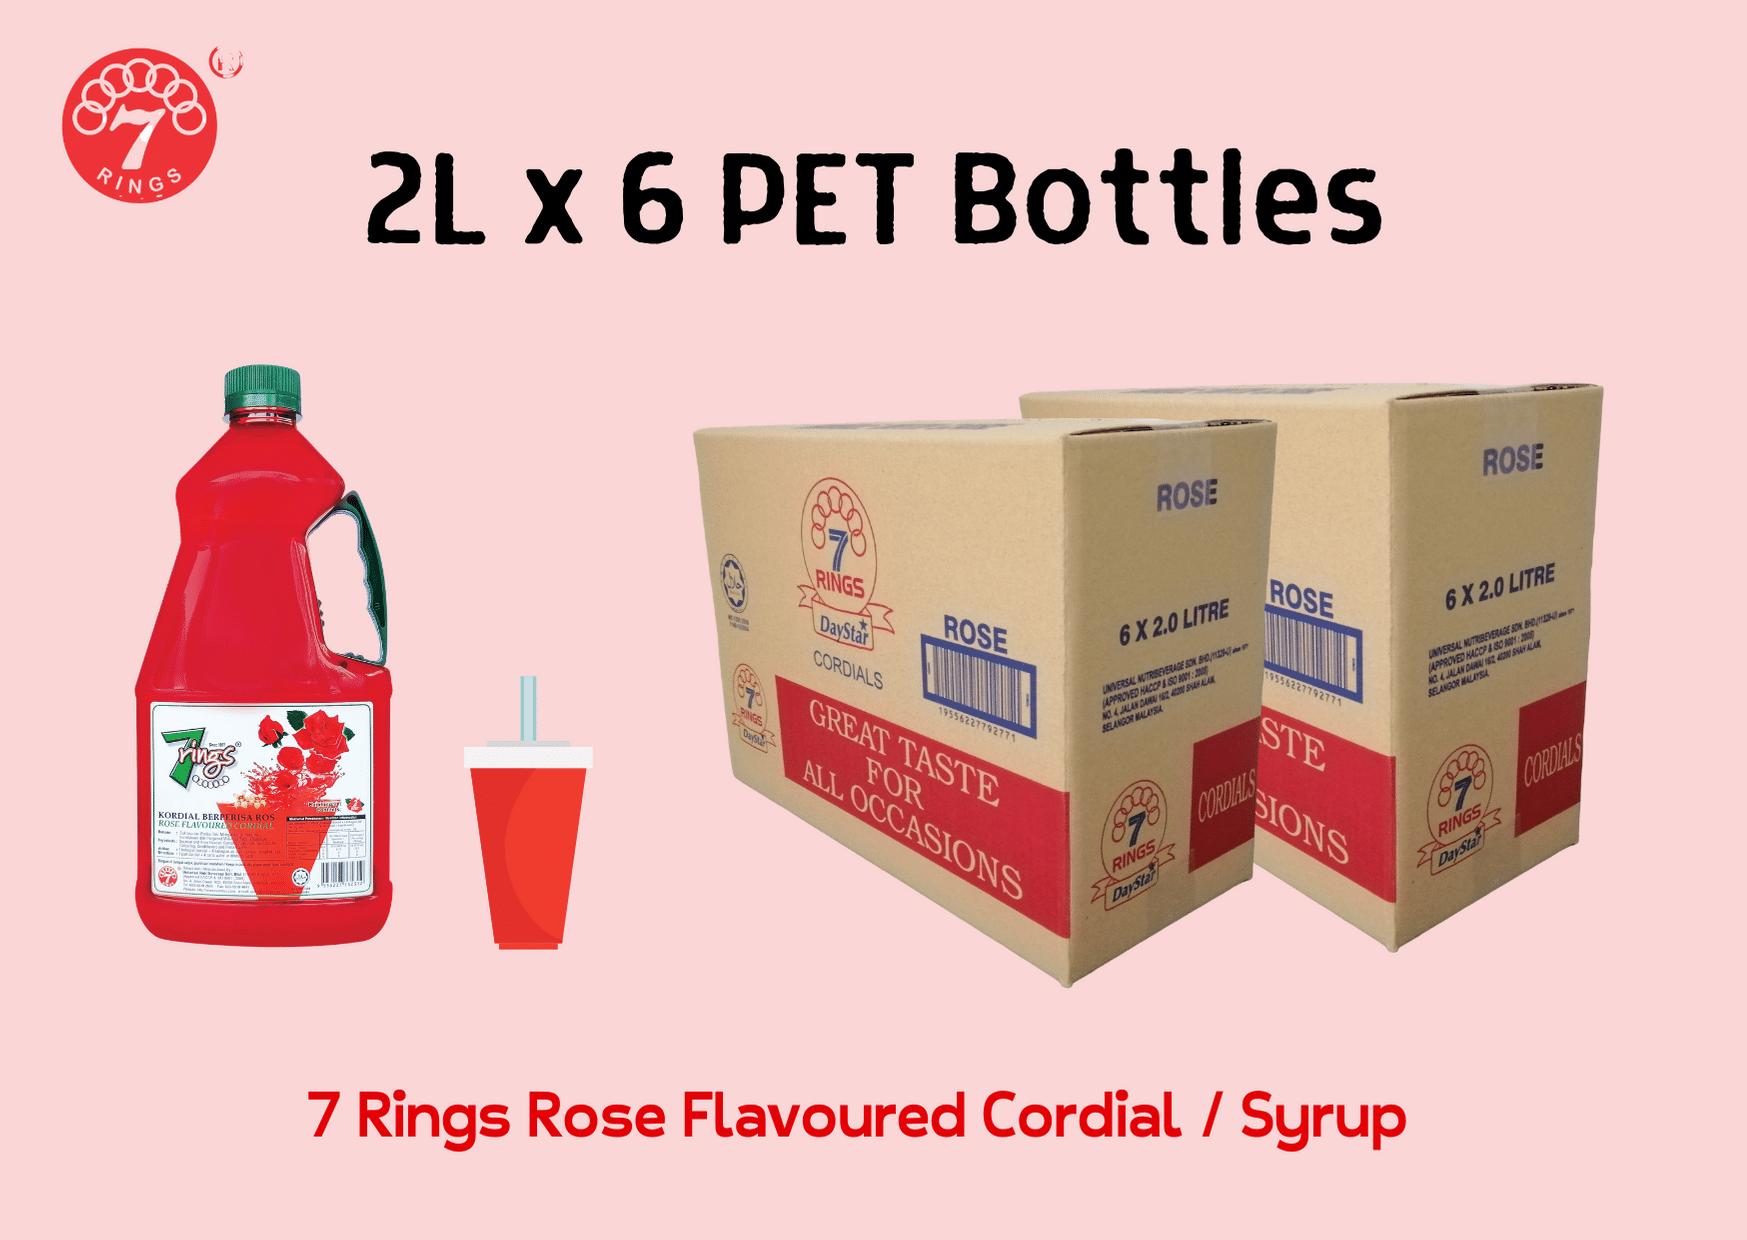 6 Bottles 7 Rings 2L Rose Flavoured Cordial